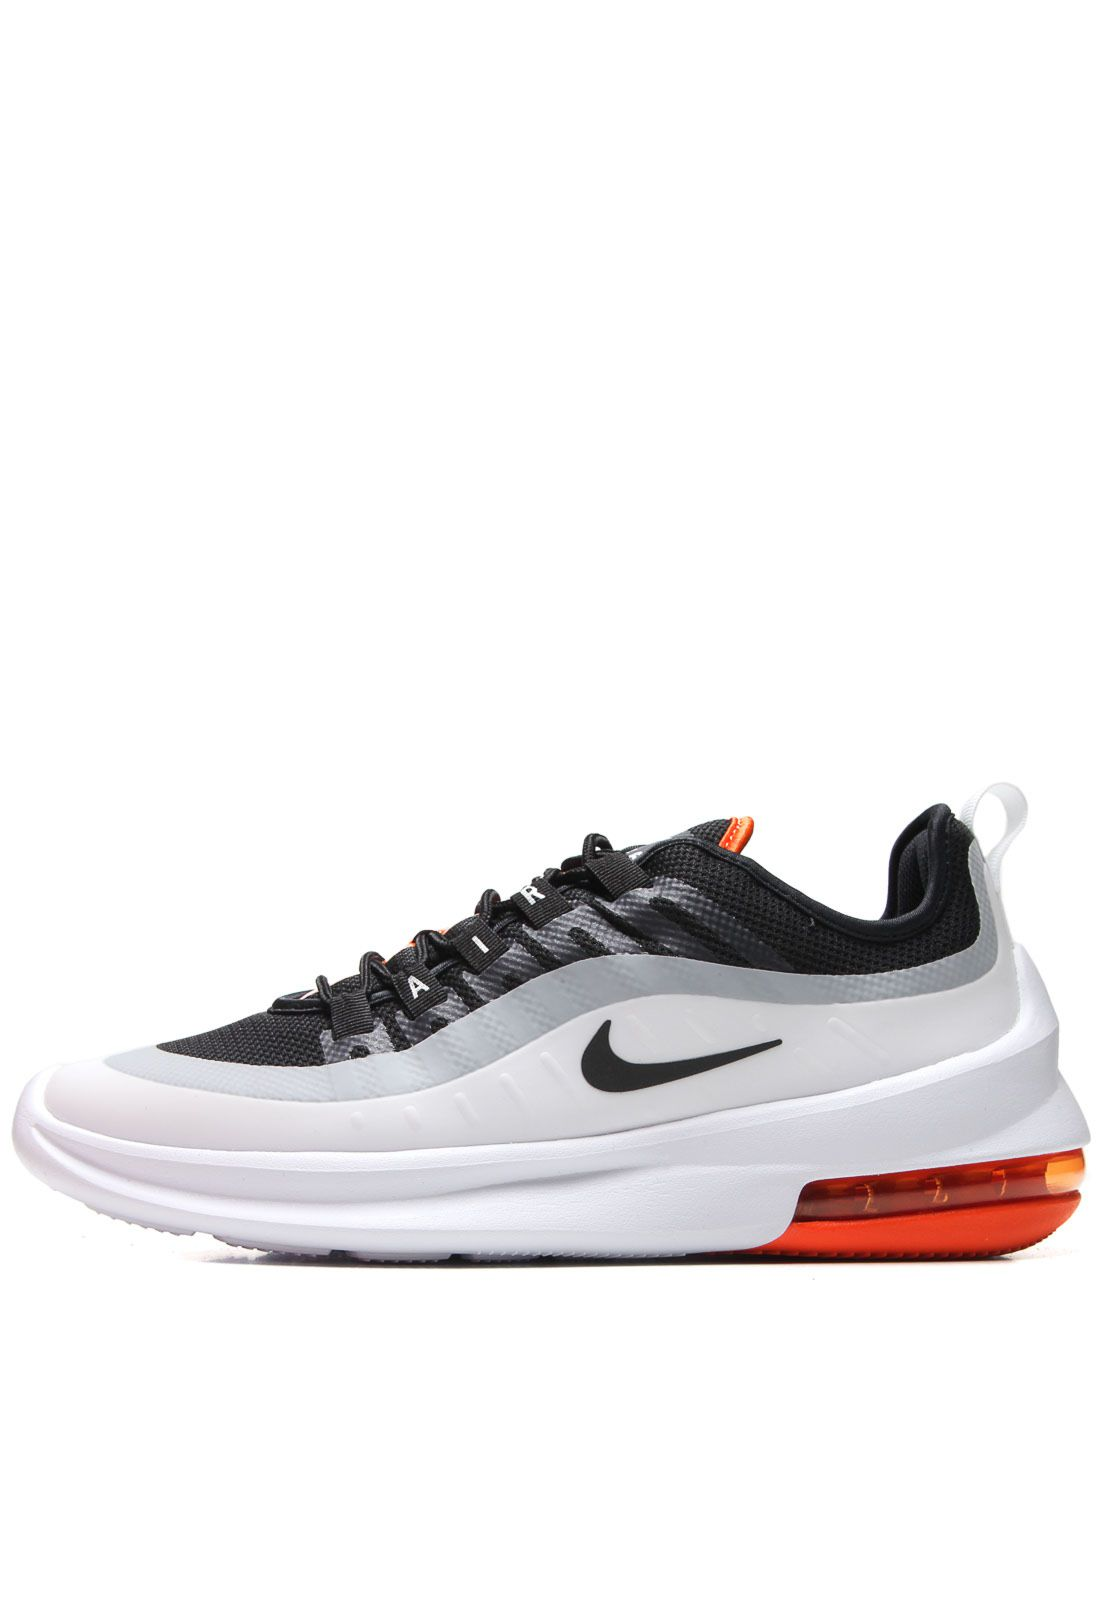 Tenis Nike Air Max Axis Preto Branco e Laranja